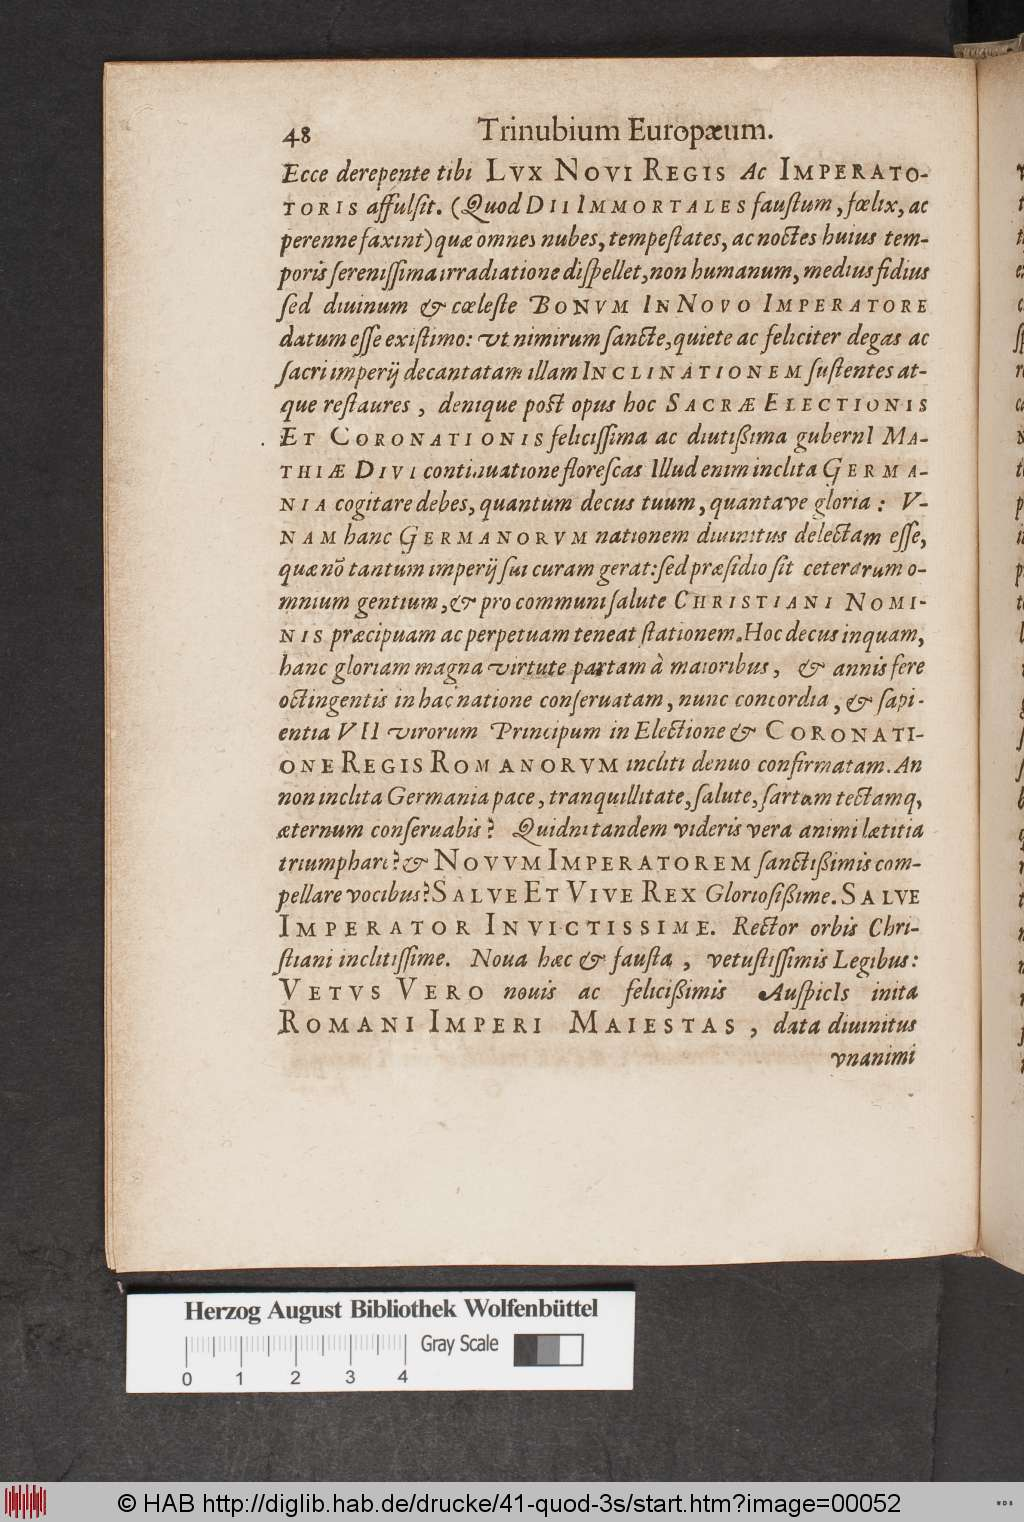 http://diglib.hab.de/drucke/41-quod-3s/00052.jpg